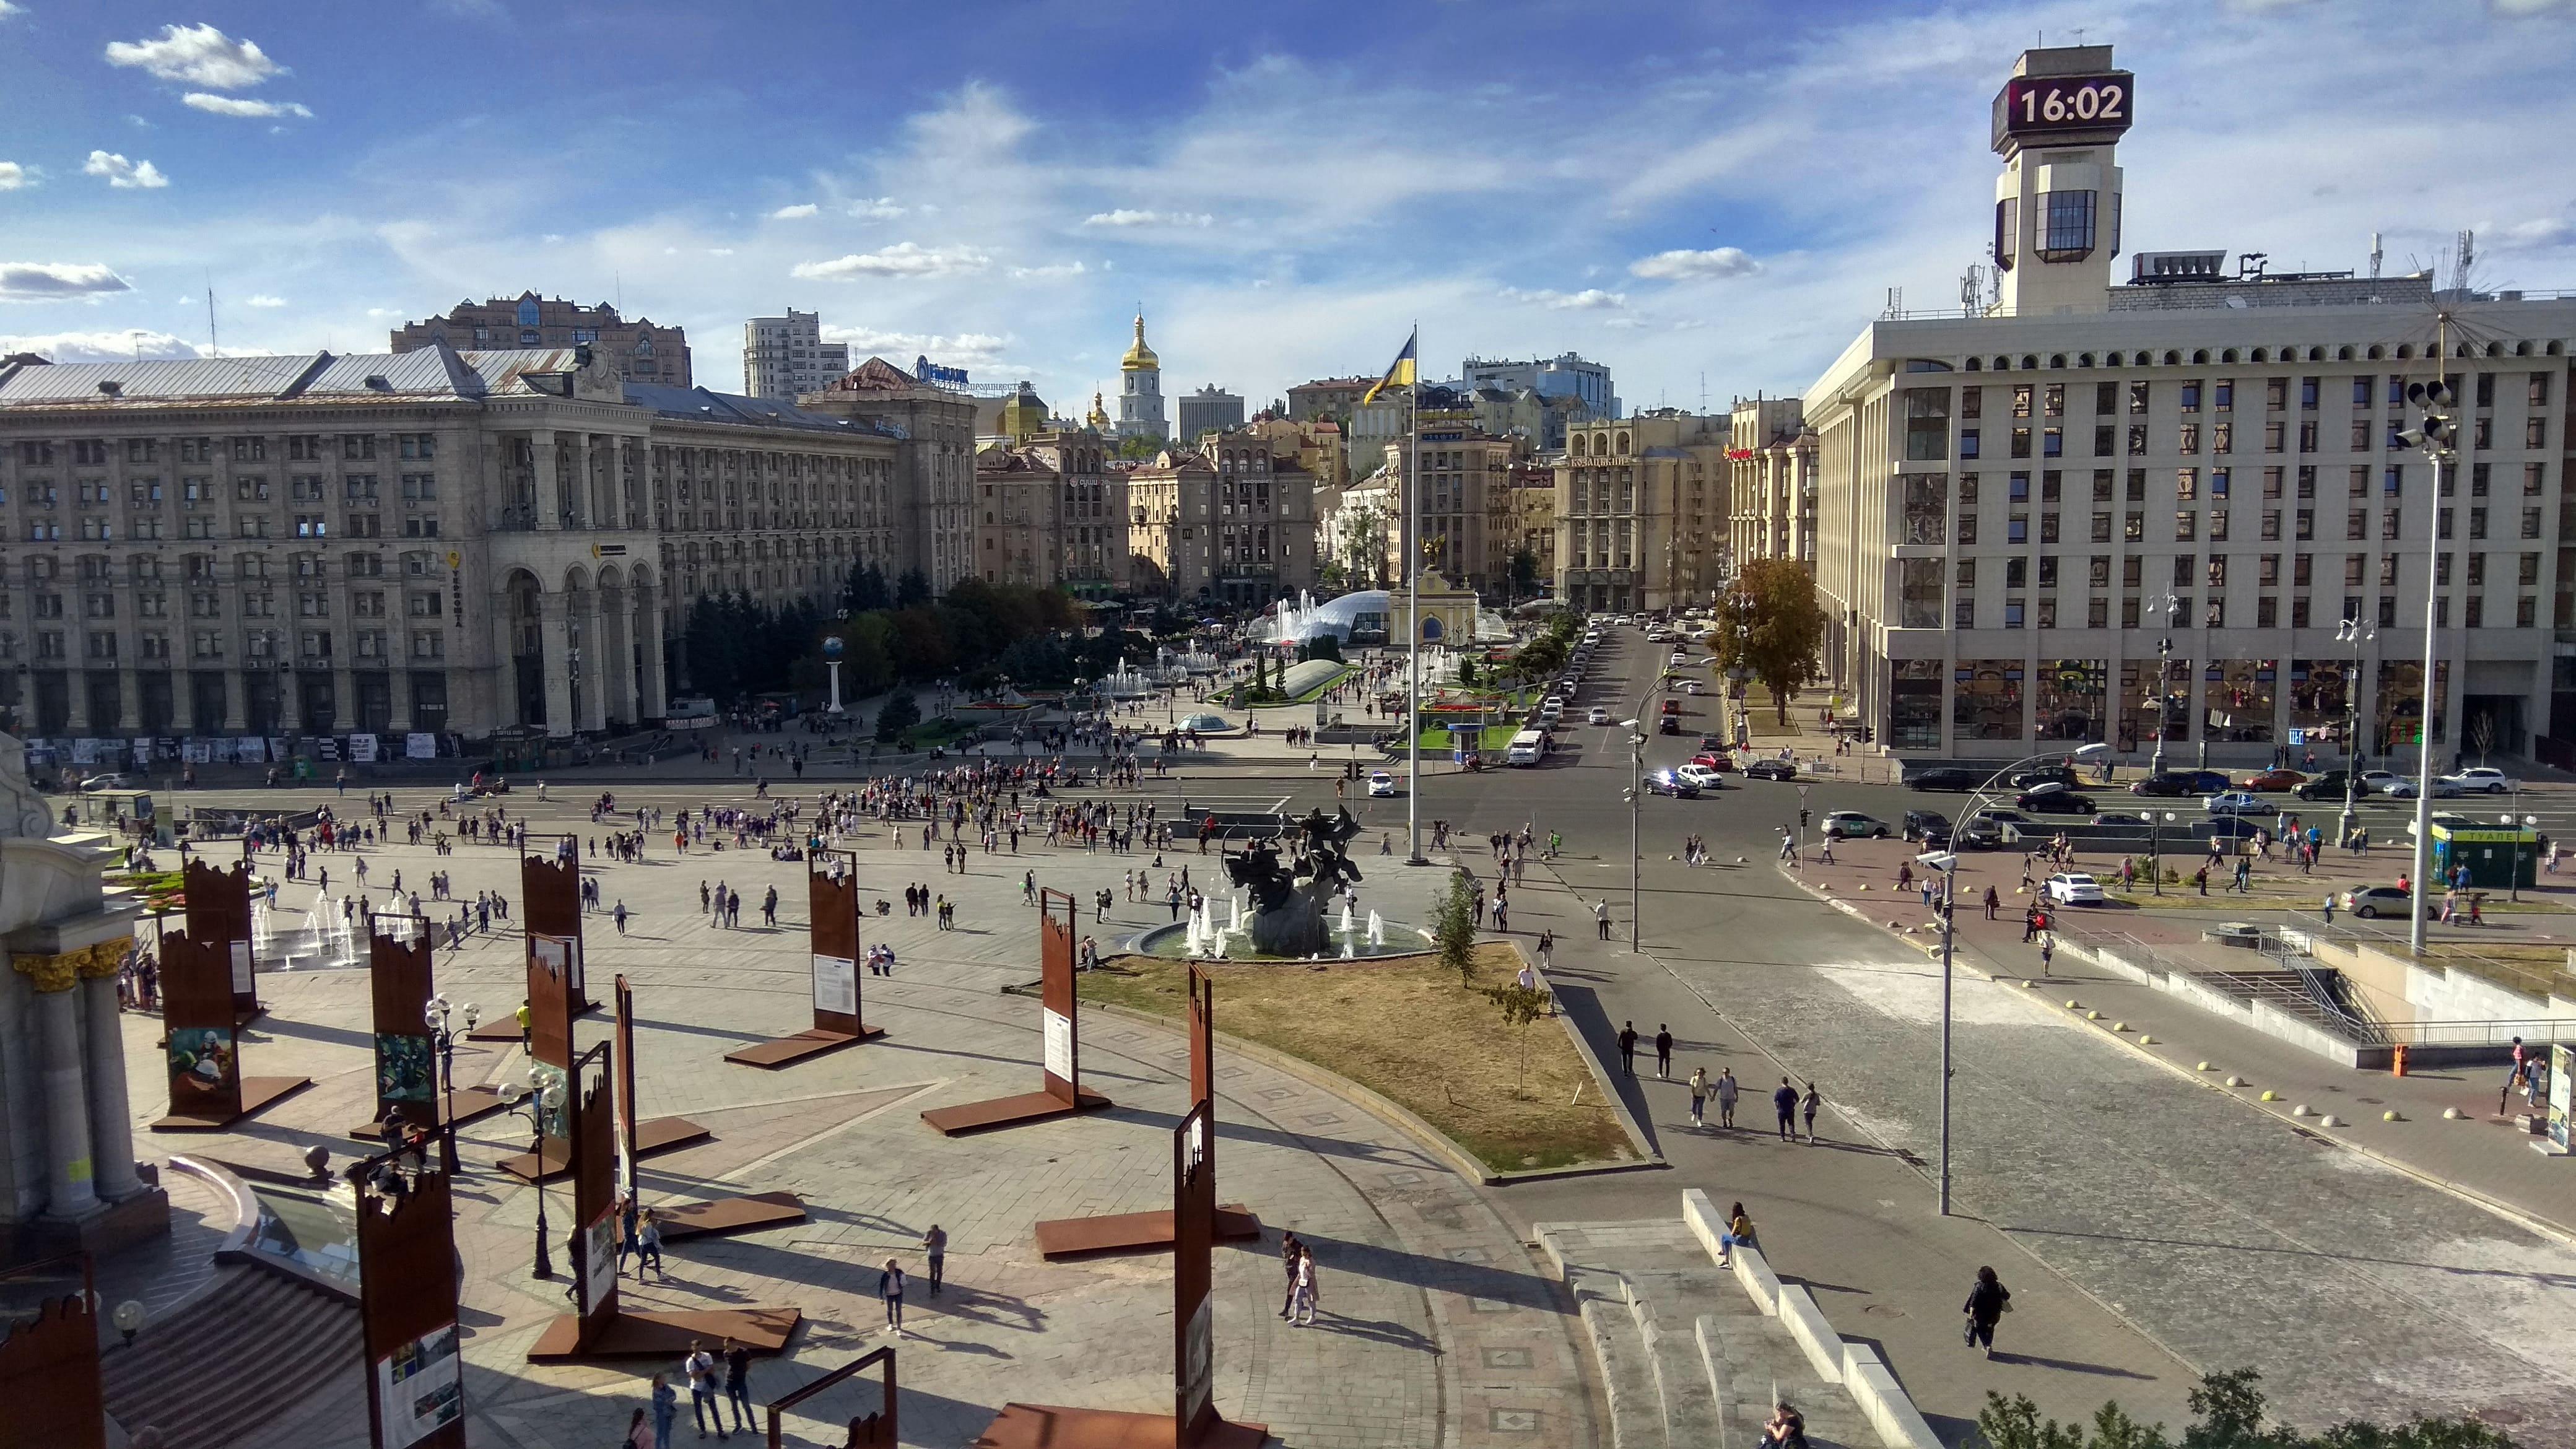 HDoboi.Kiev.ua - Киева, Украина, Майдан независимости